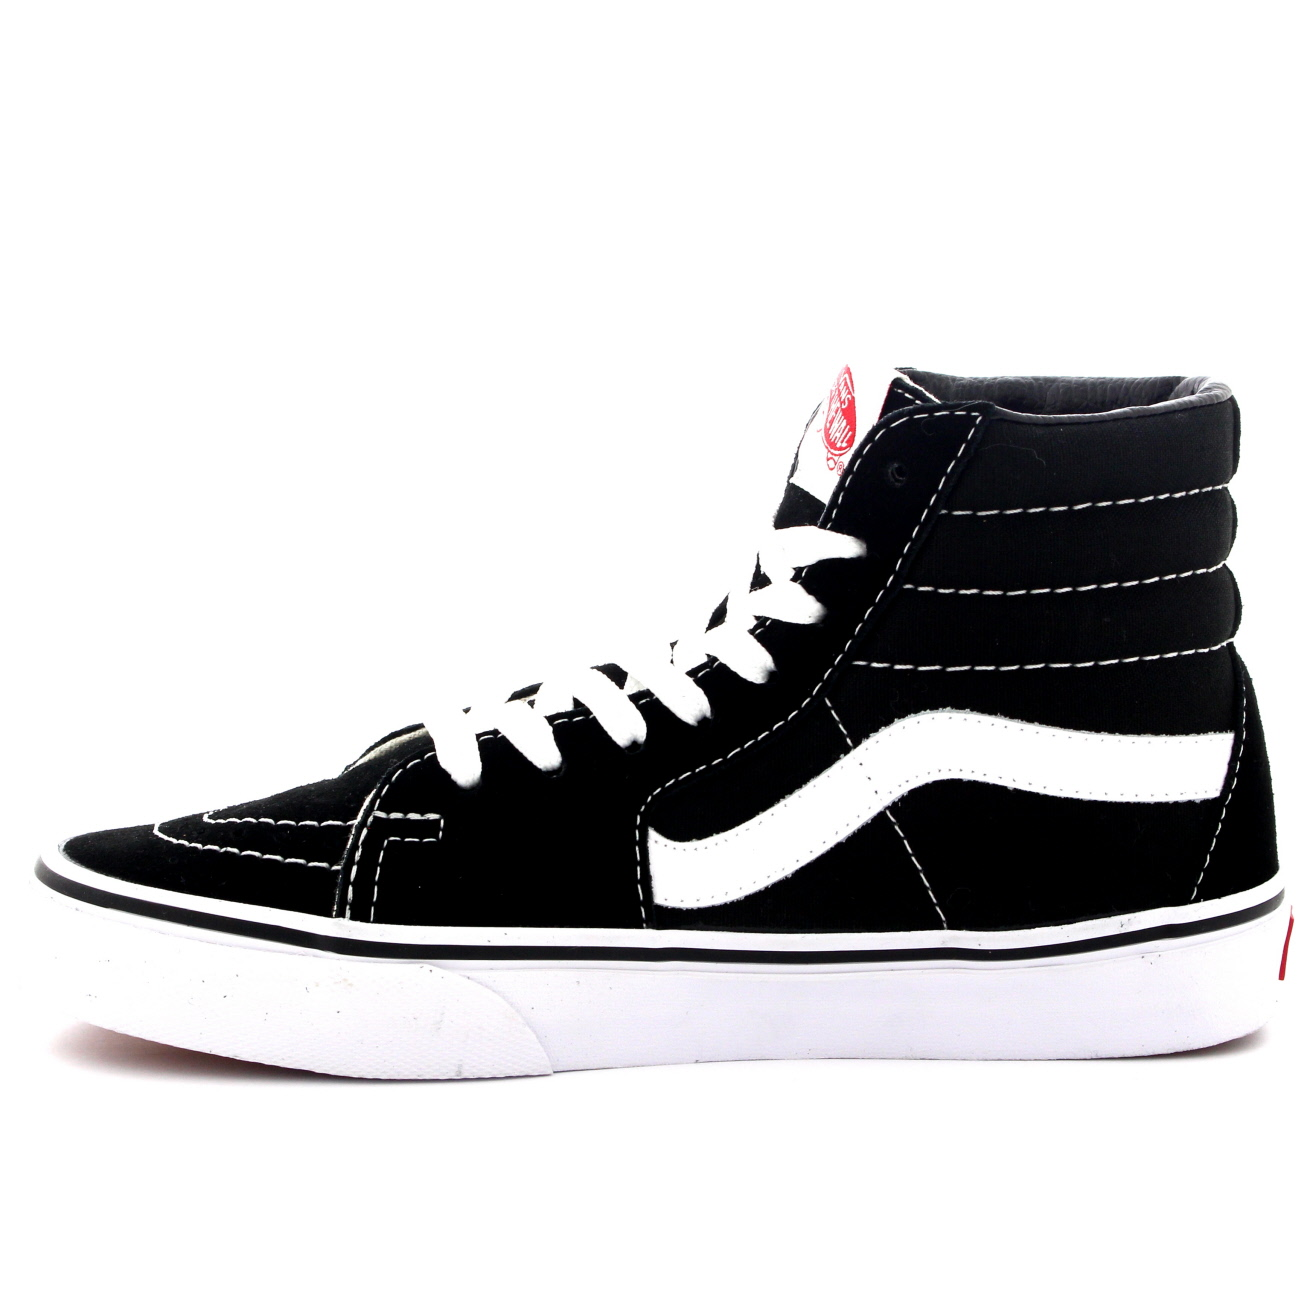 b8c35f7fe5e Unisex Adults Vans Sk8-Hi Lace Up High Top Canvas Skate Shoes ...